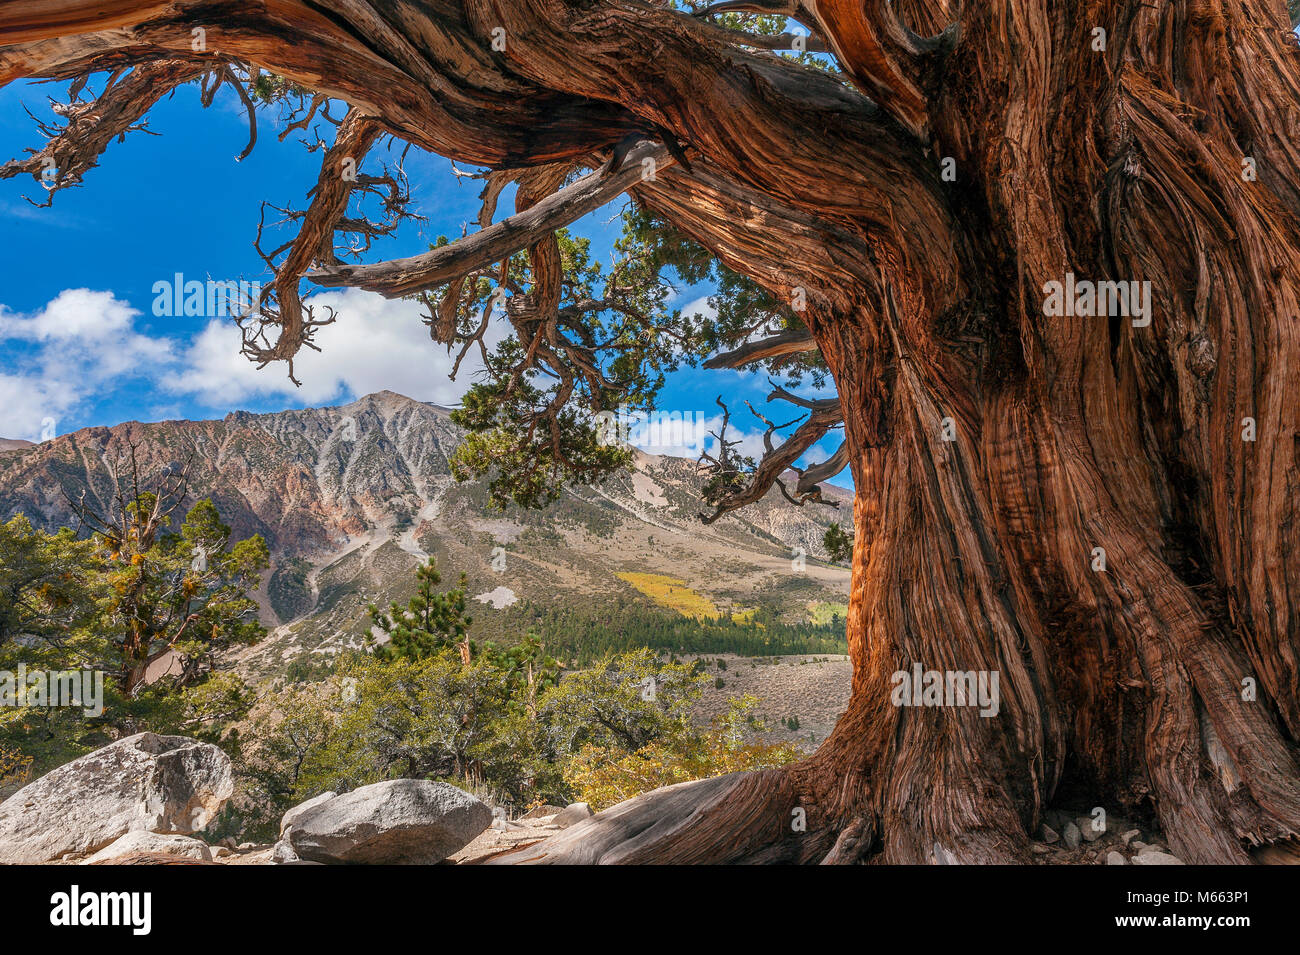 Cedar, Mount Gibbs, Mount Dana, Eastern Sierra, Inyo National Forest, Eastern Sierra CA - Stock Image